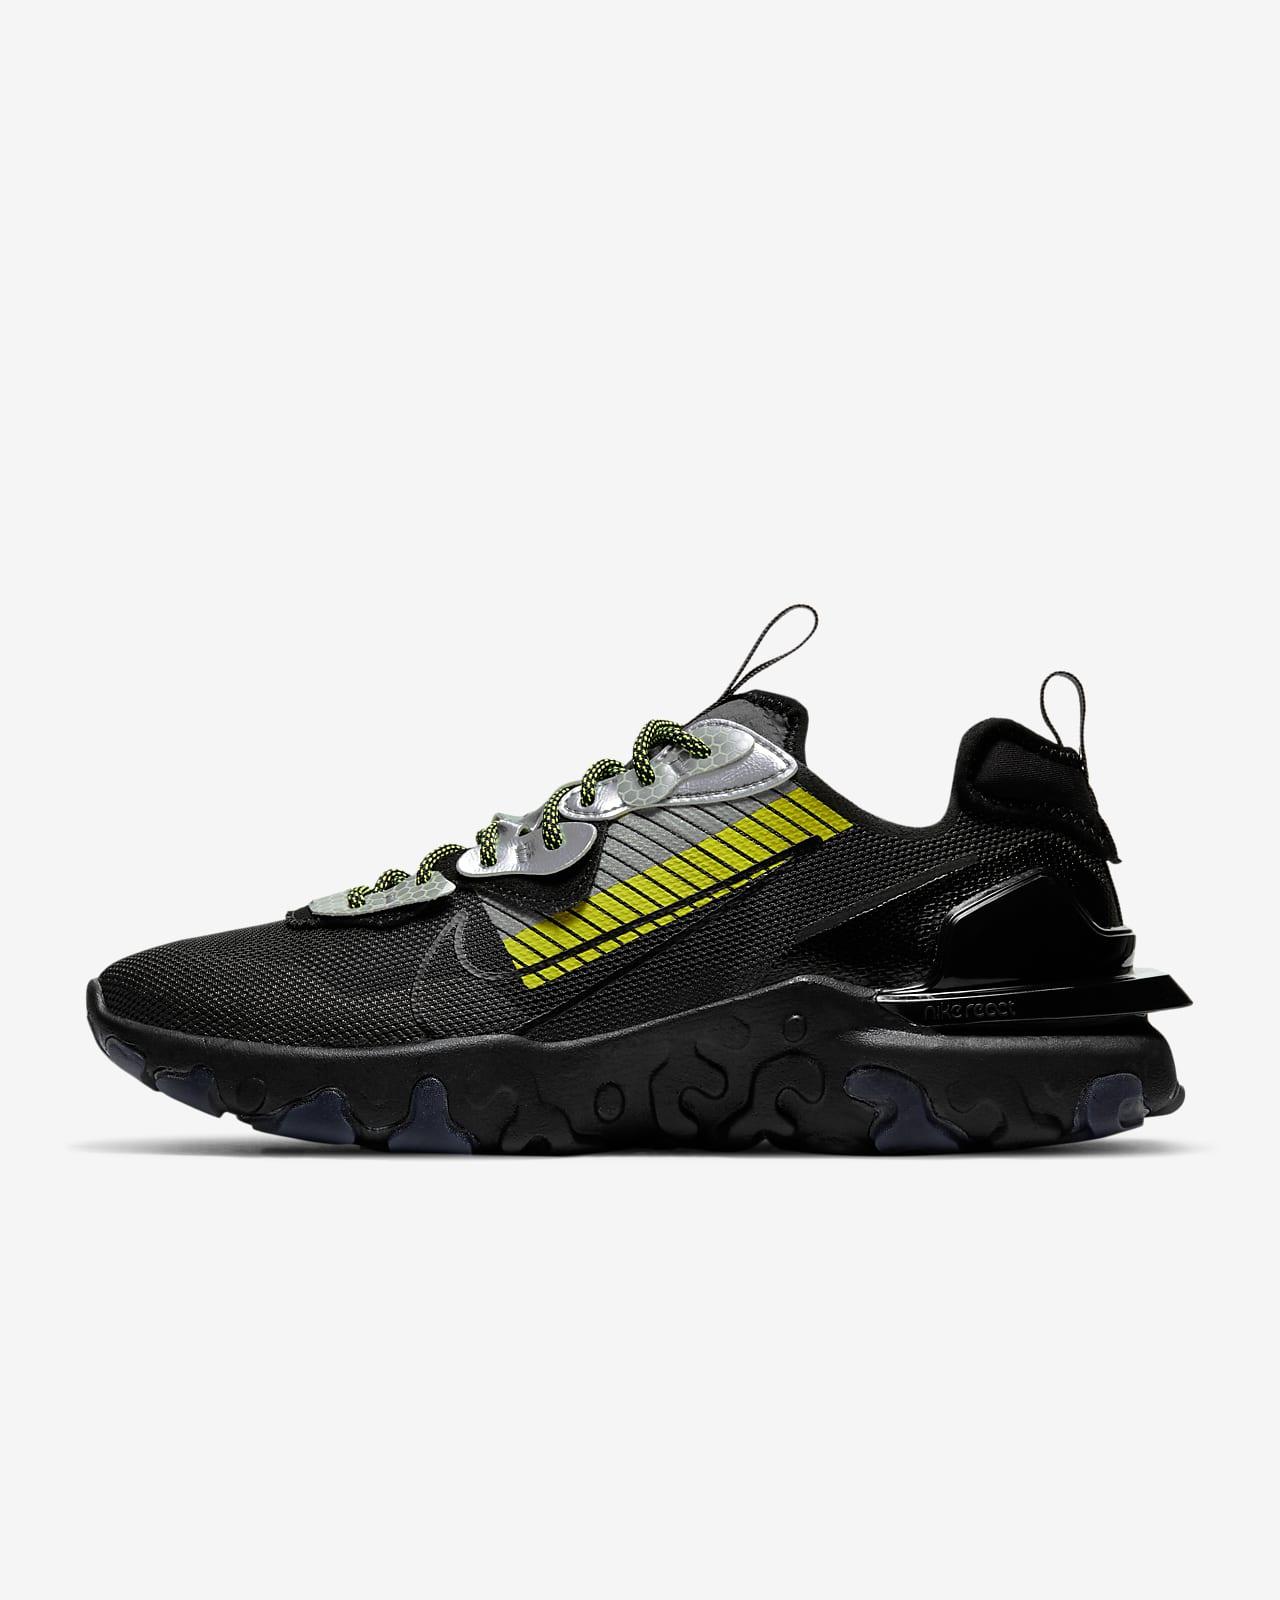 Nike React Vision PRM 3M™ Men's Shoe